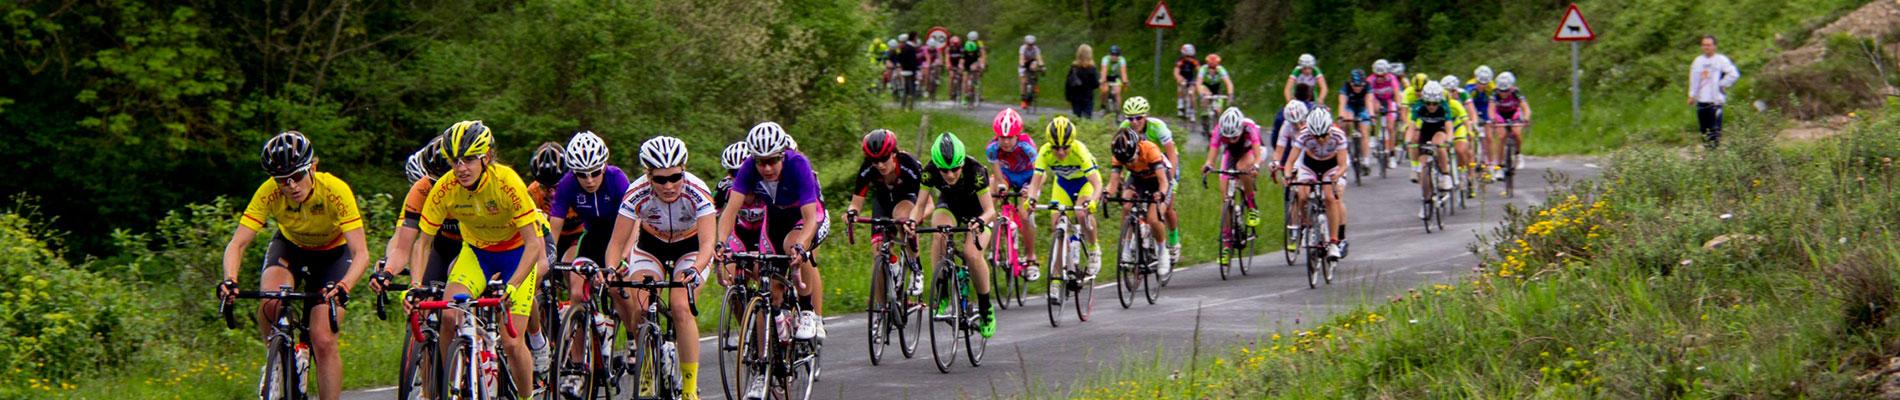 Pelotón de la Vuelta a Burgos 2015. Foto © Vuelta a Burgos